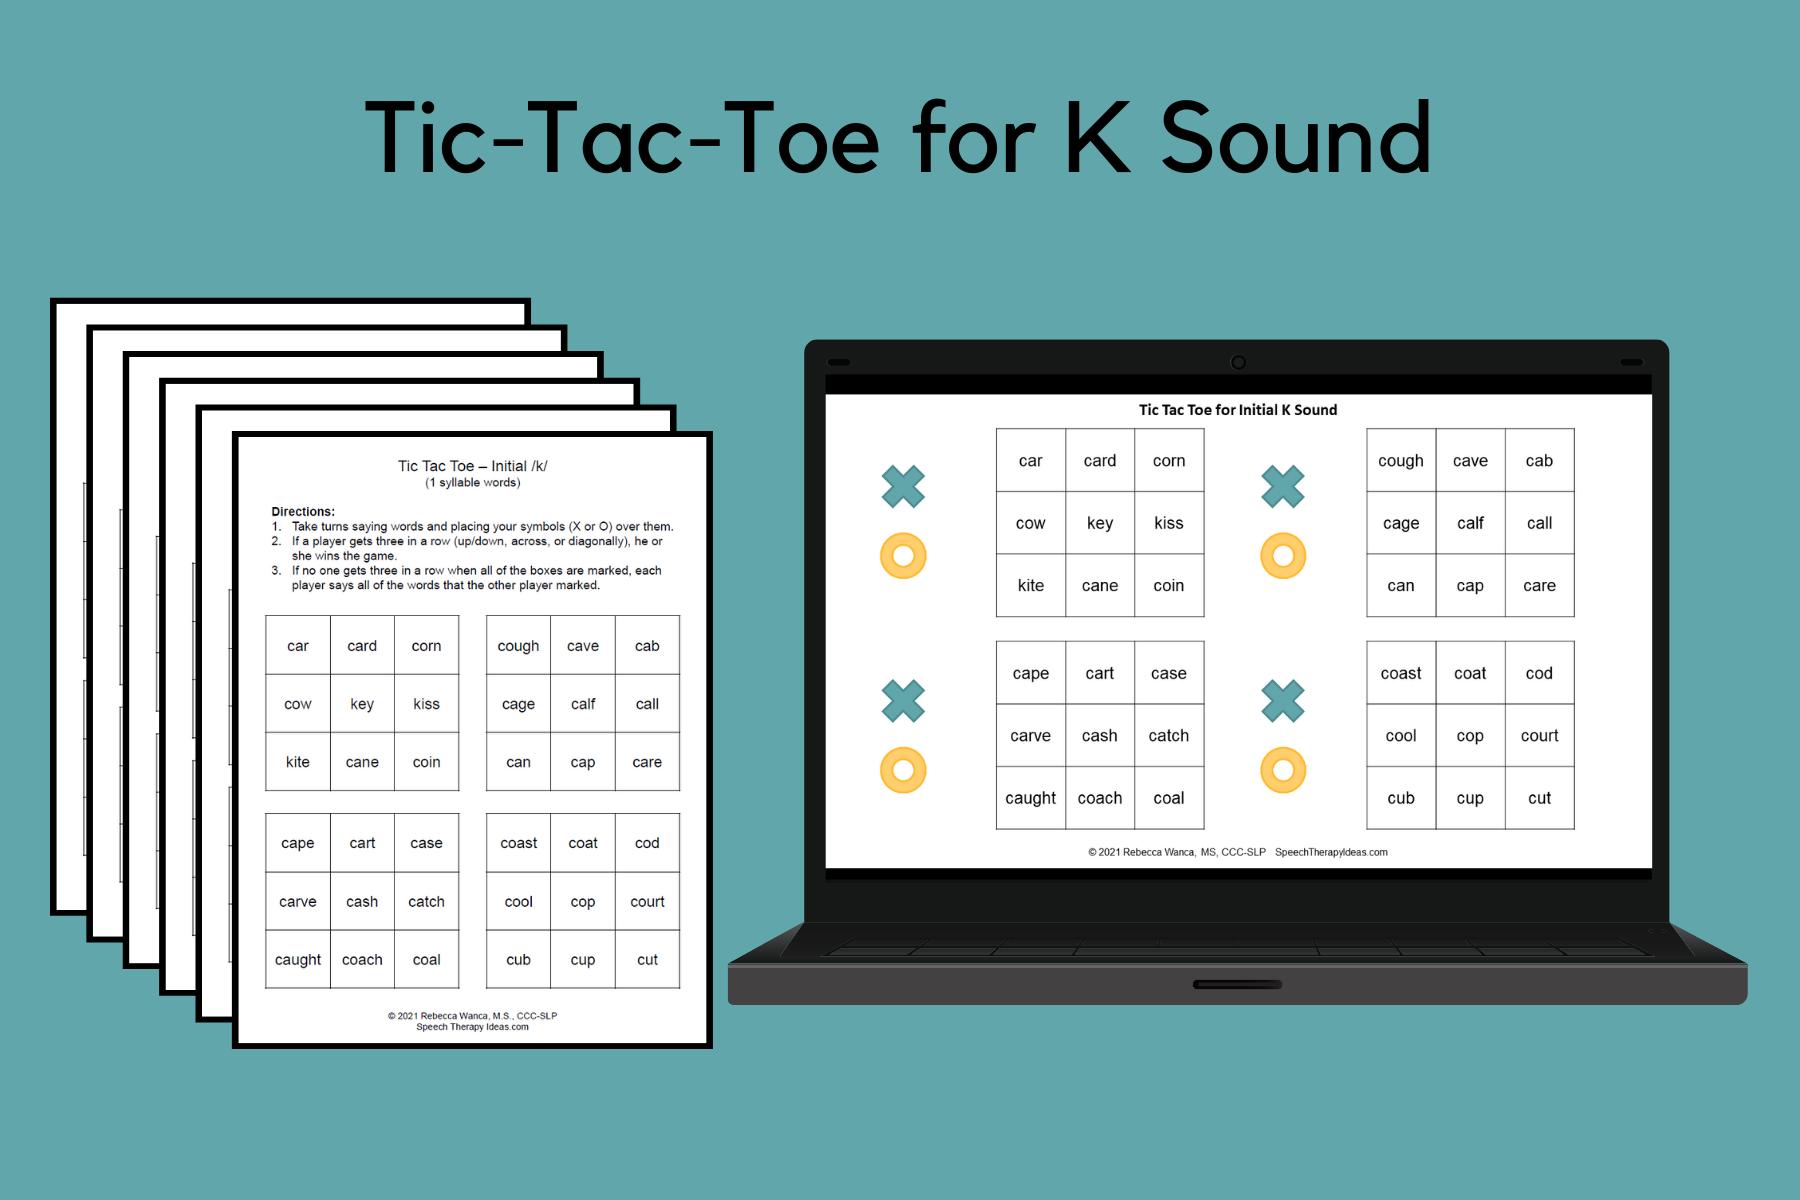 Tic-Tac-Toe Games for K Sound